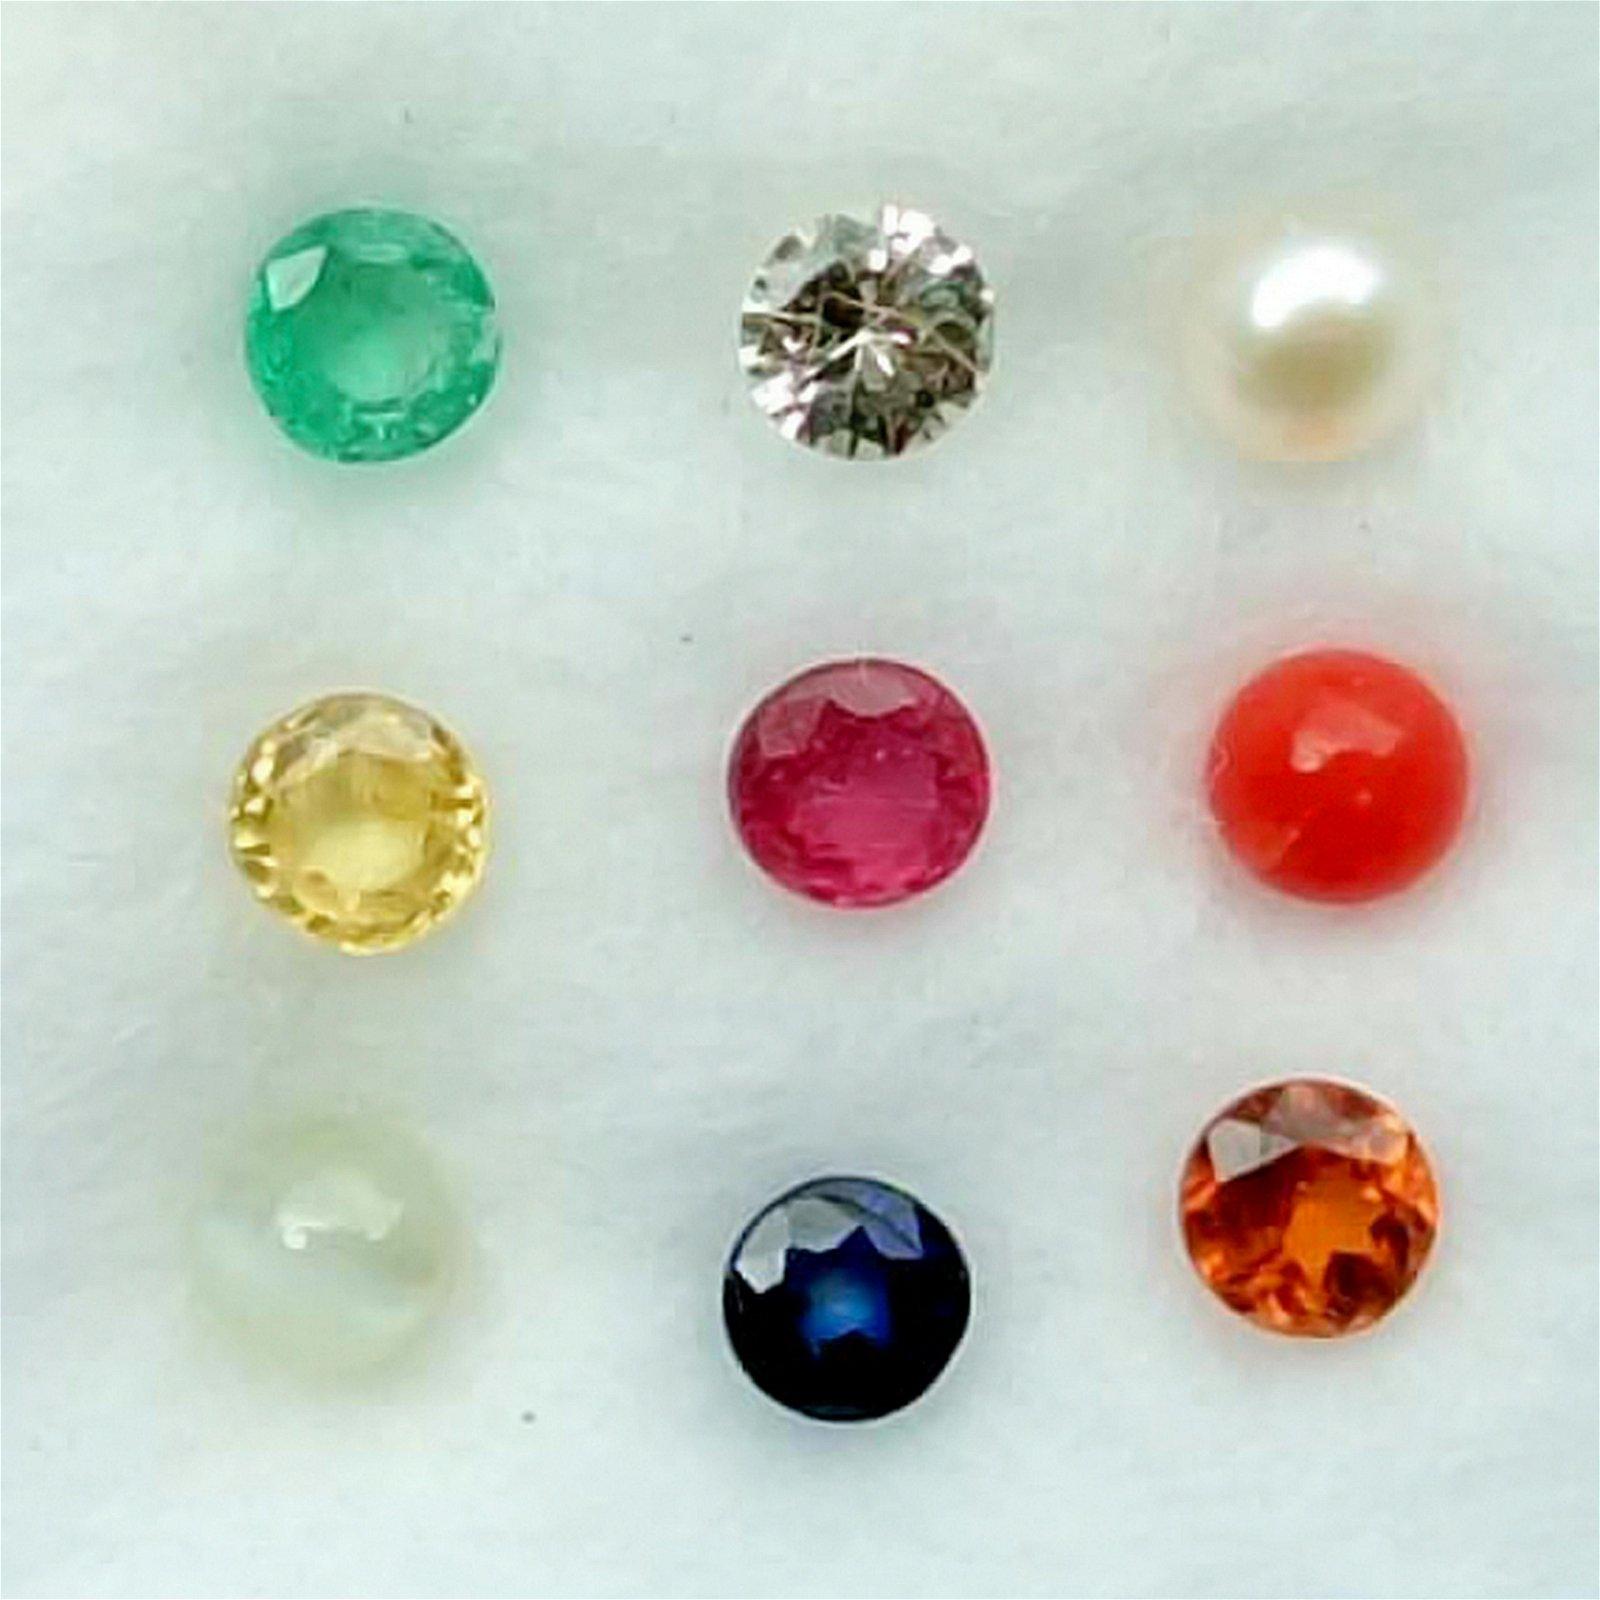 Calibrate 3.5 mm Round Natural Navratna 9 Gemstones Set